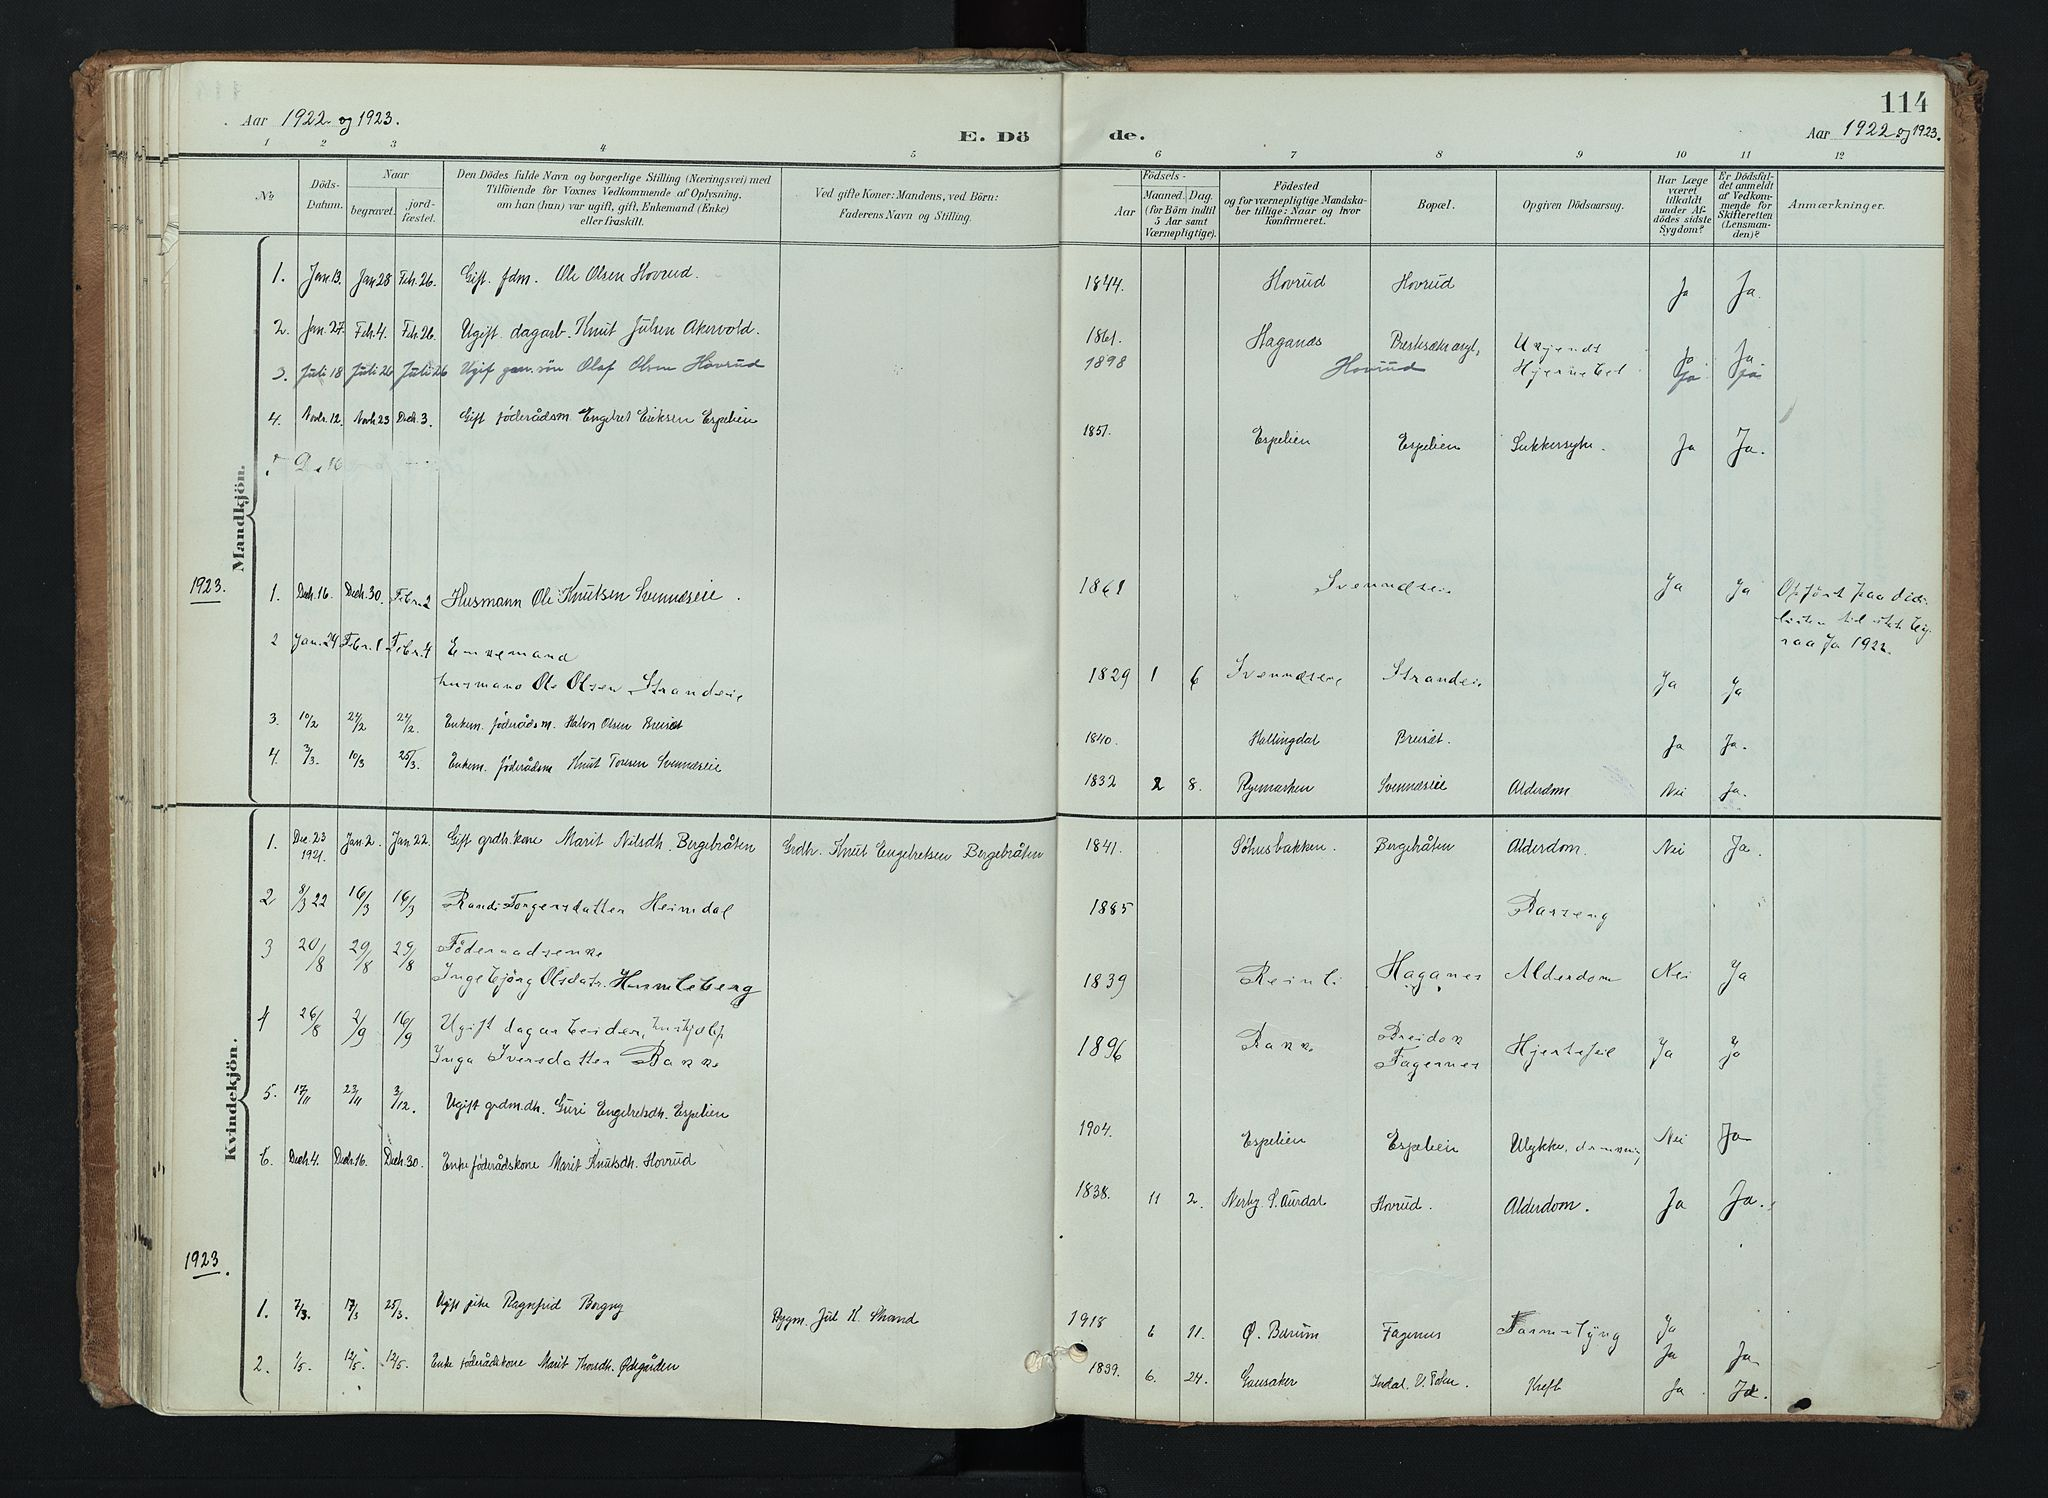 SAH, Nord-Aurdal prestekontor, Ministerialbok nr. 16, 1897-1925, s. 114